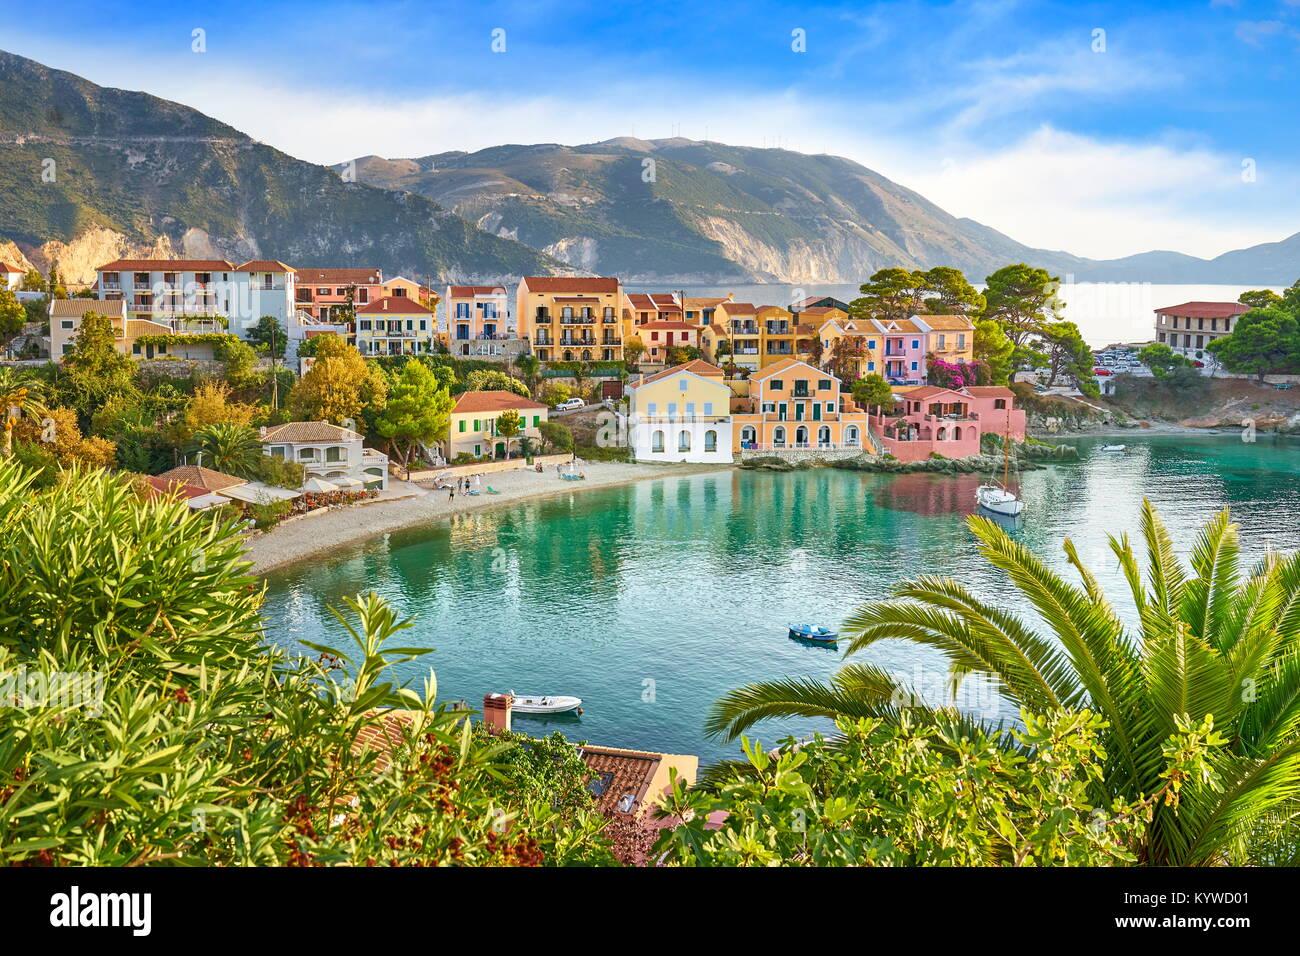 Assos village, Kefalonia Island, Greece - Stock Image